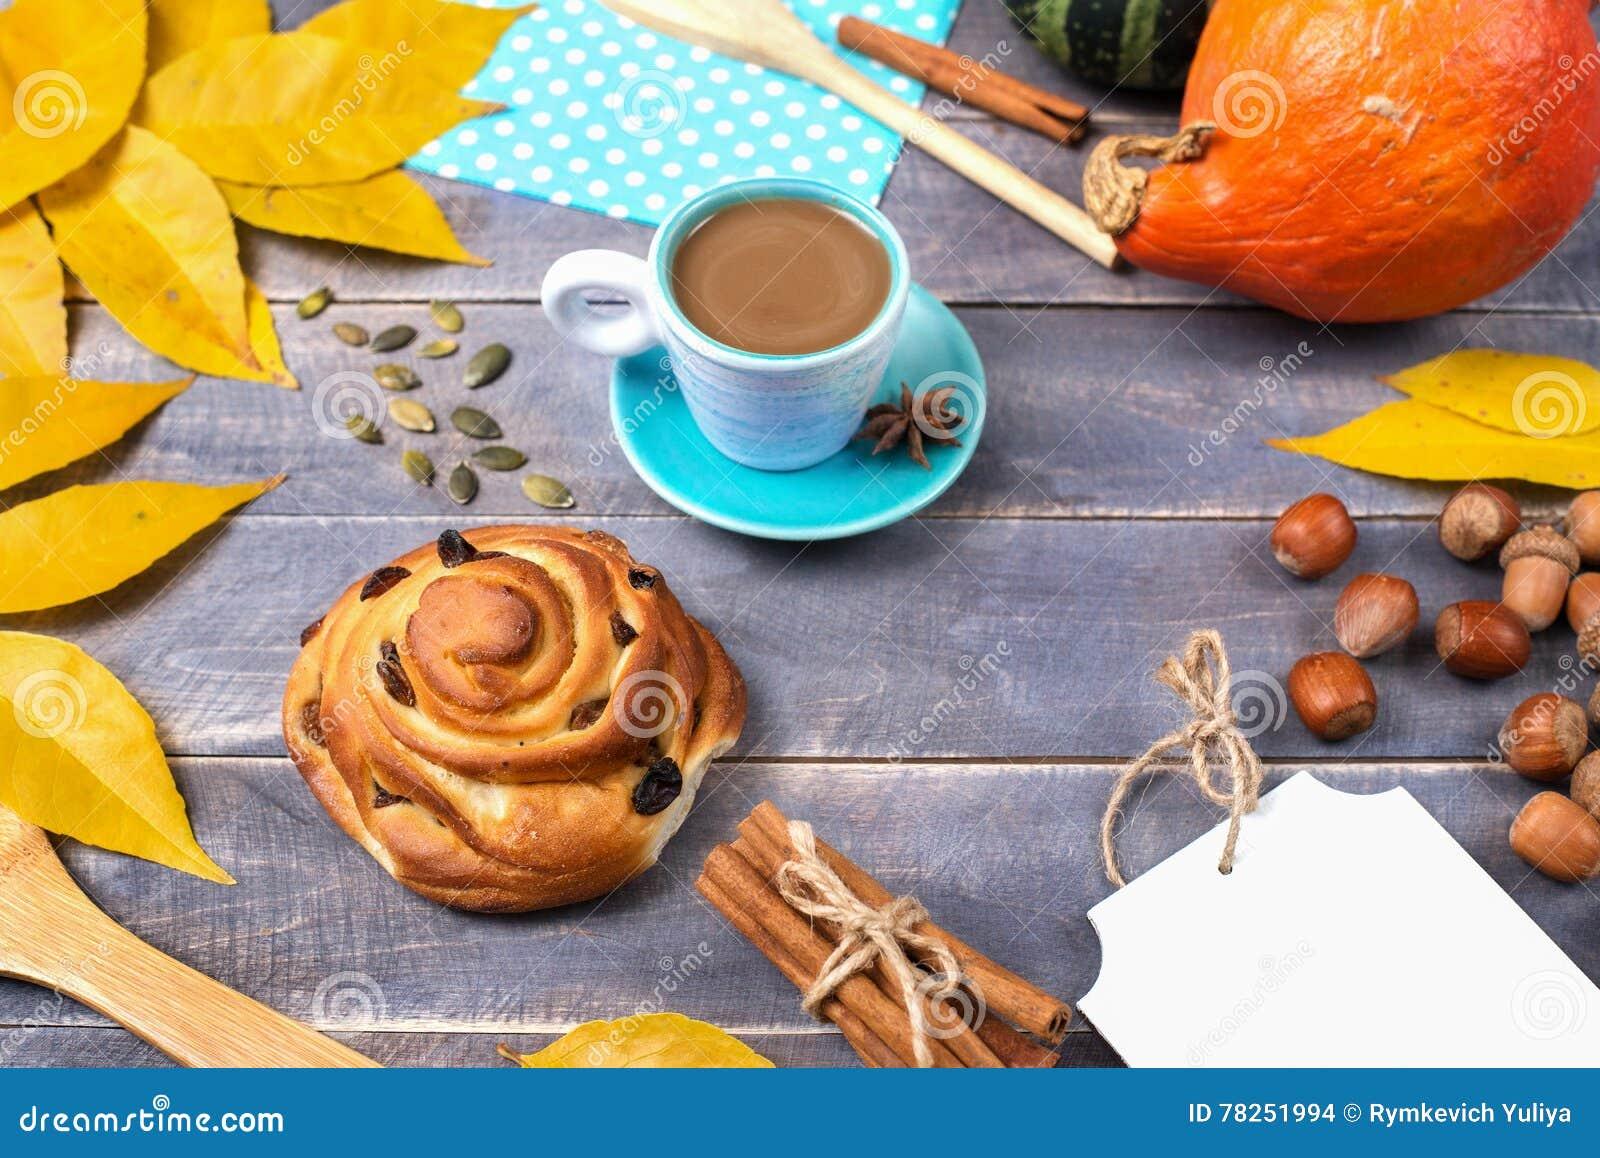 Offee Ð ¡ με την κανέλα και muffin με τις σταφίδες το φθινόπωρο stil